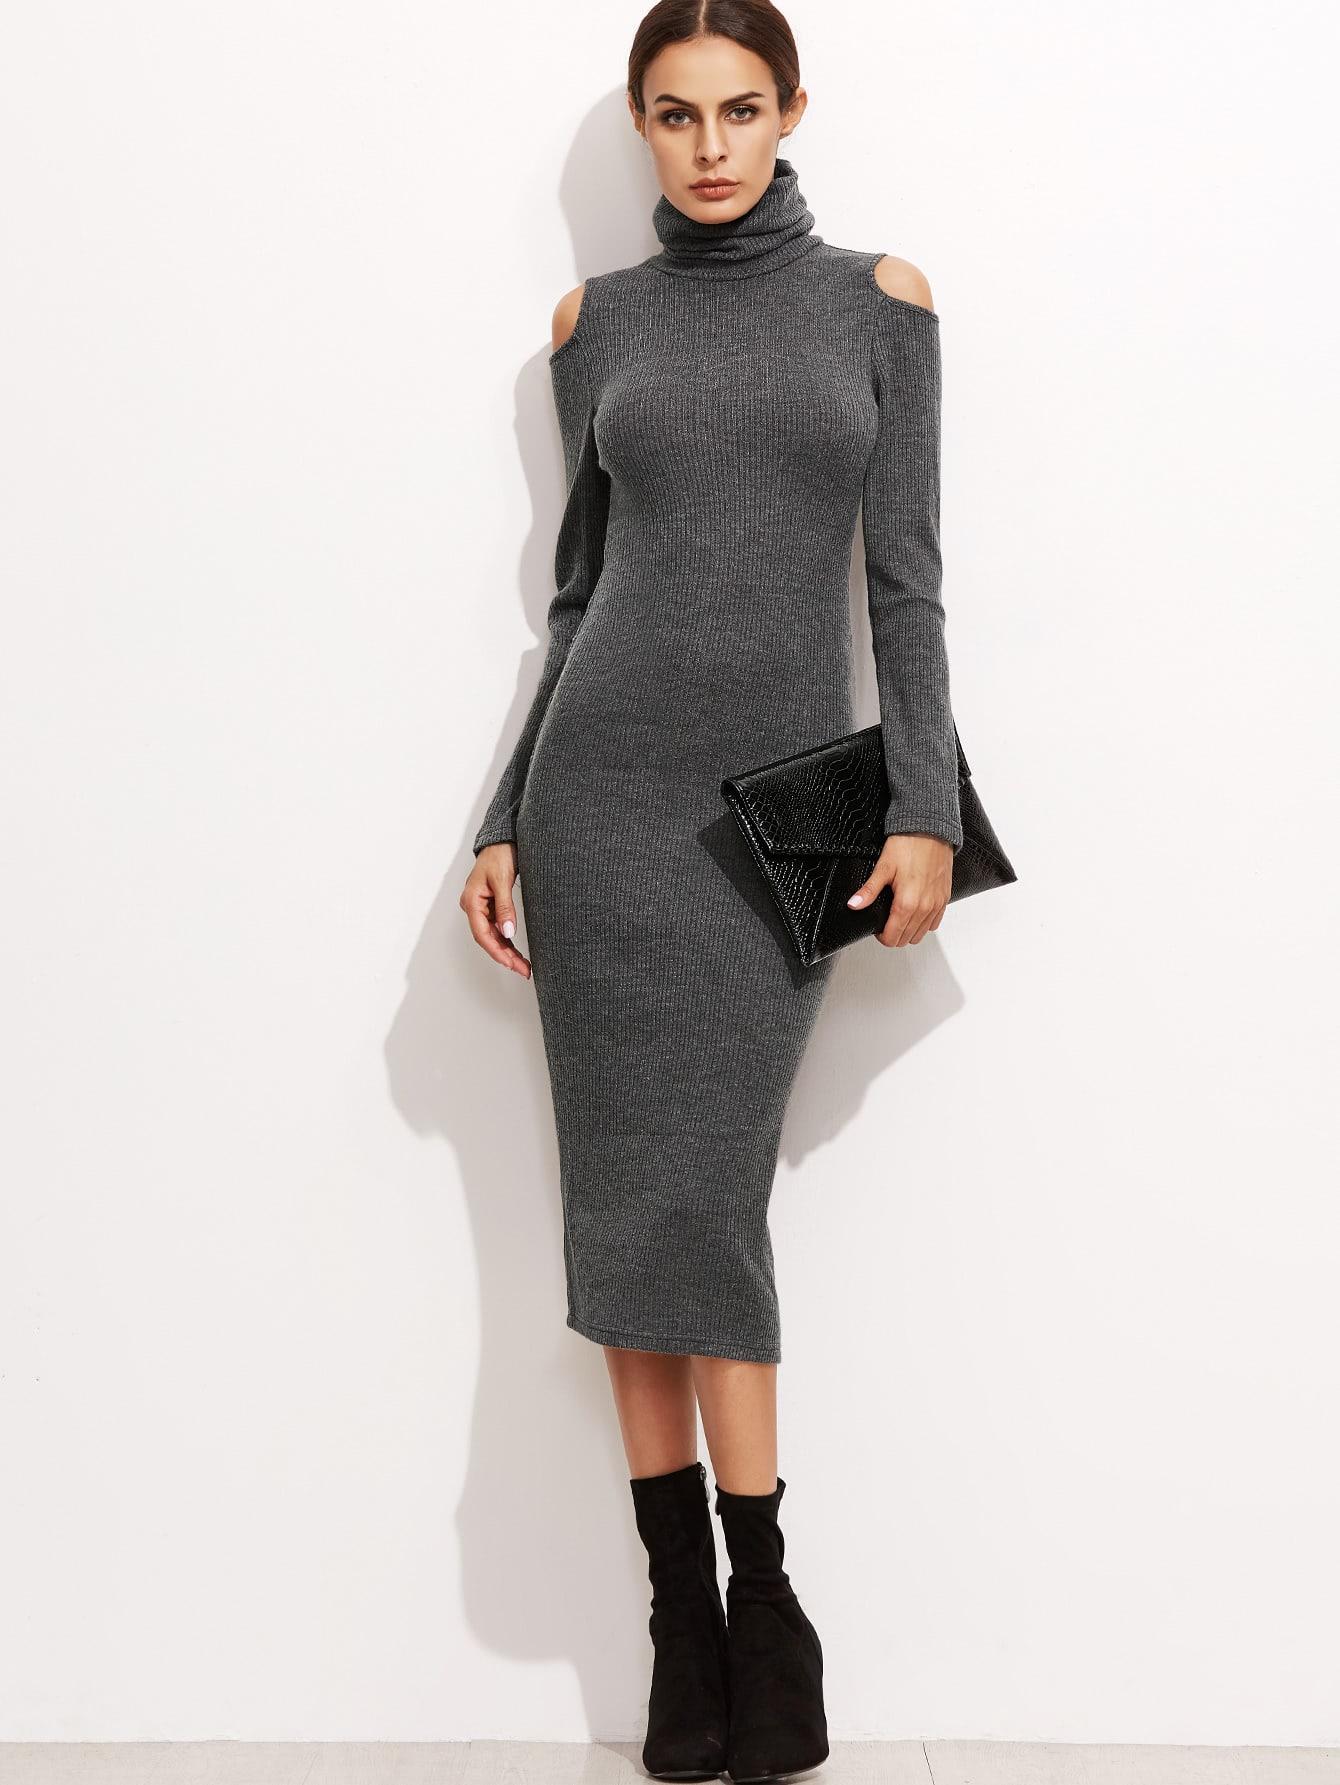 Grey High Neck Open Shoulder Ribbed Pencil Dress dress161024715